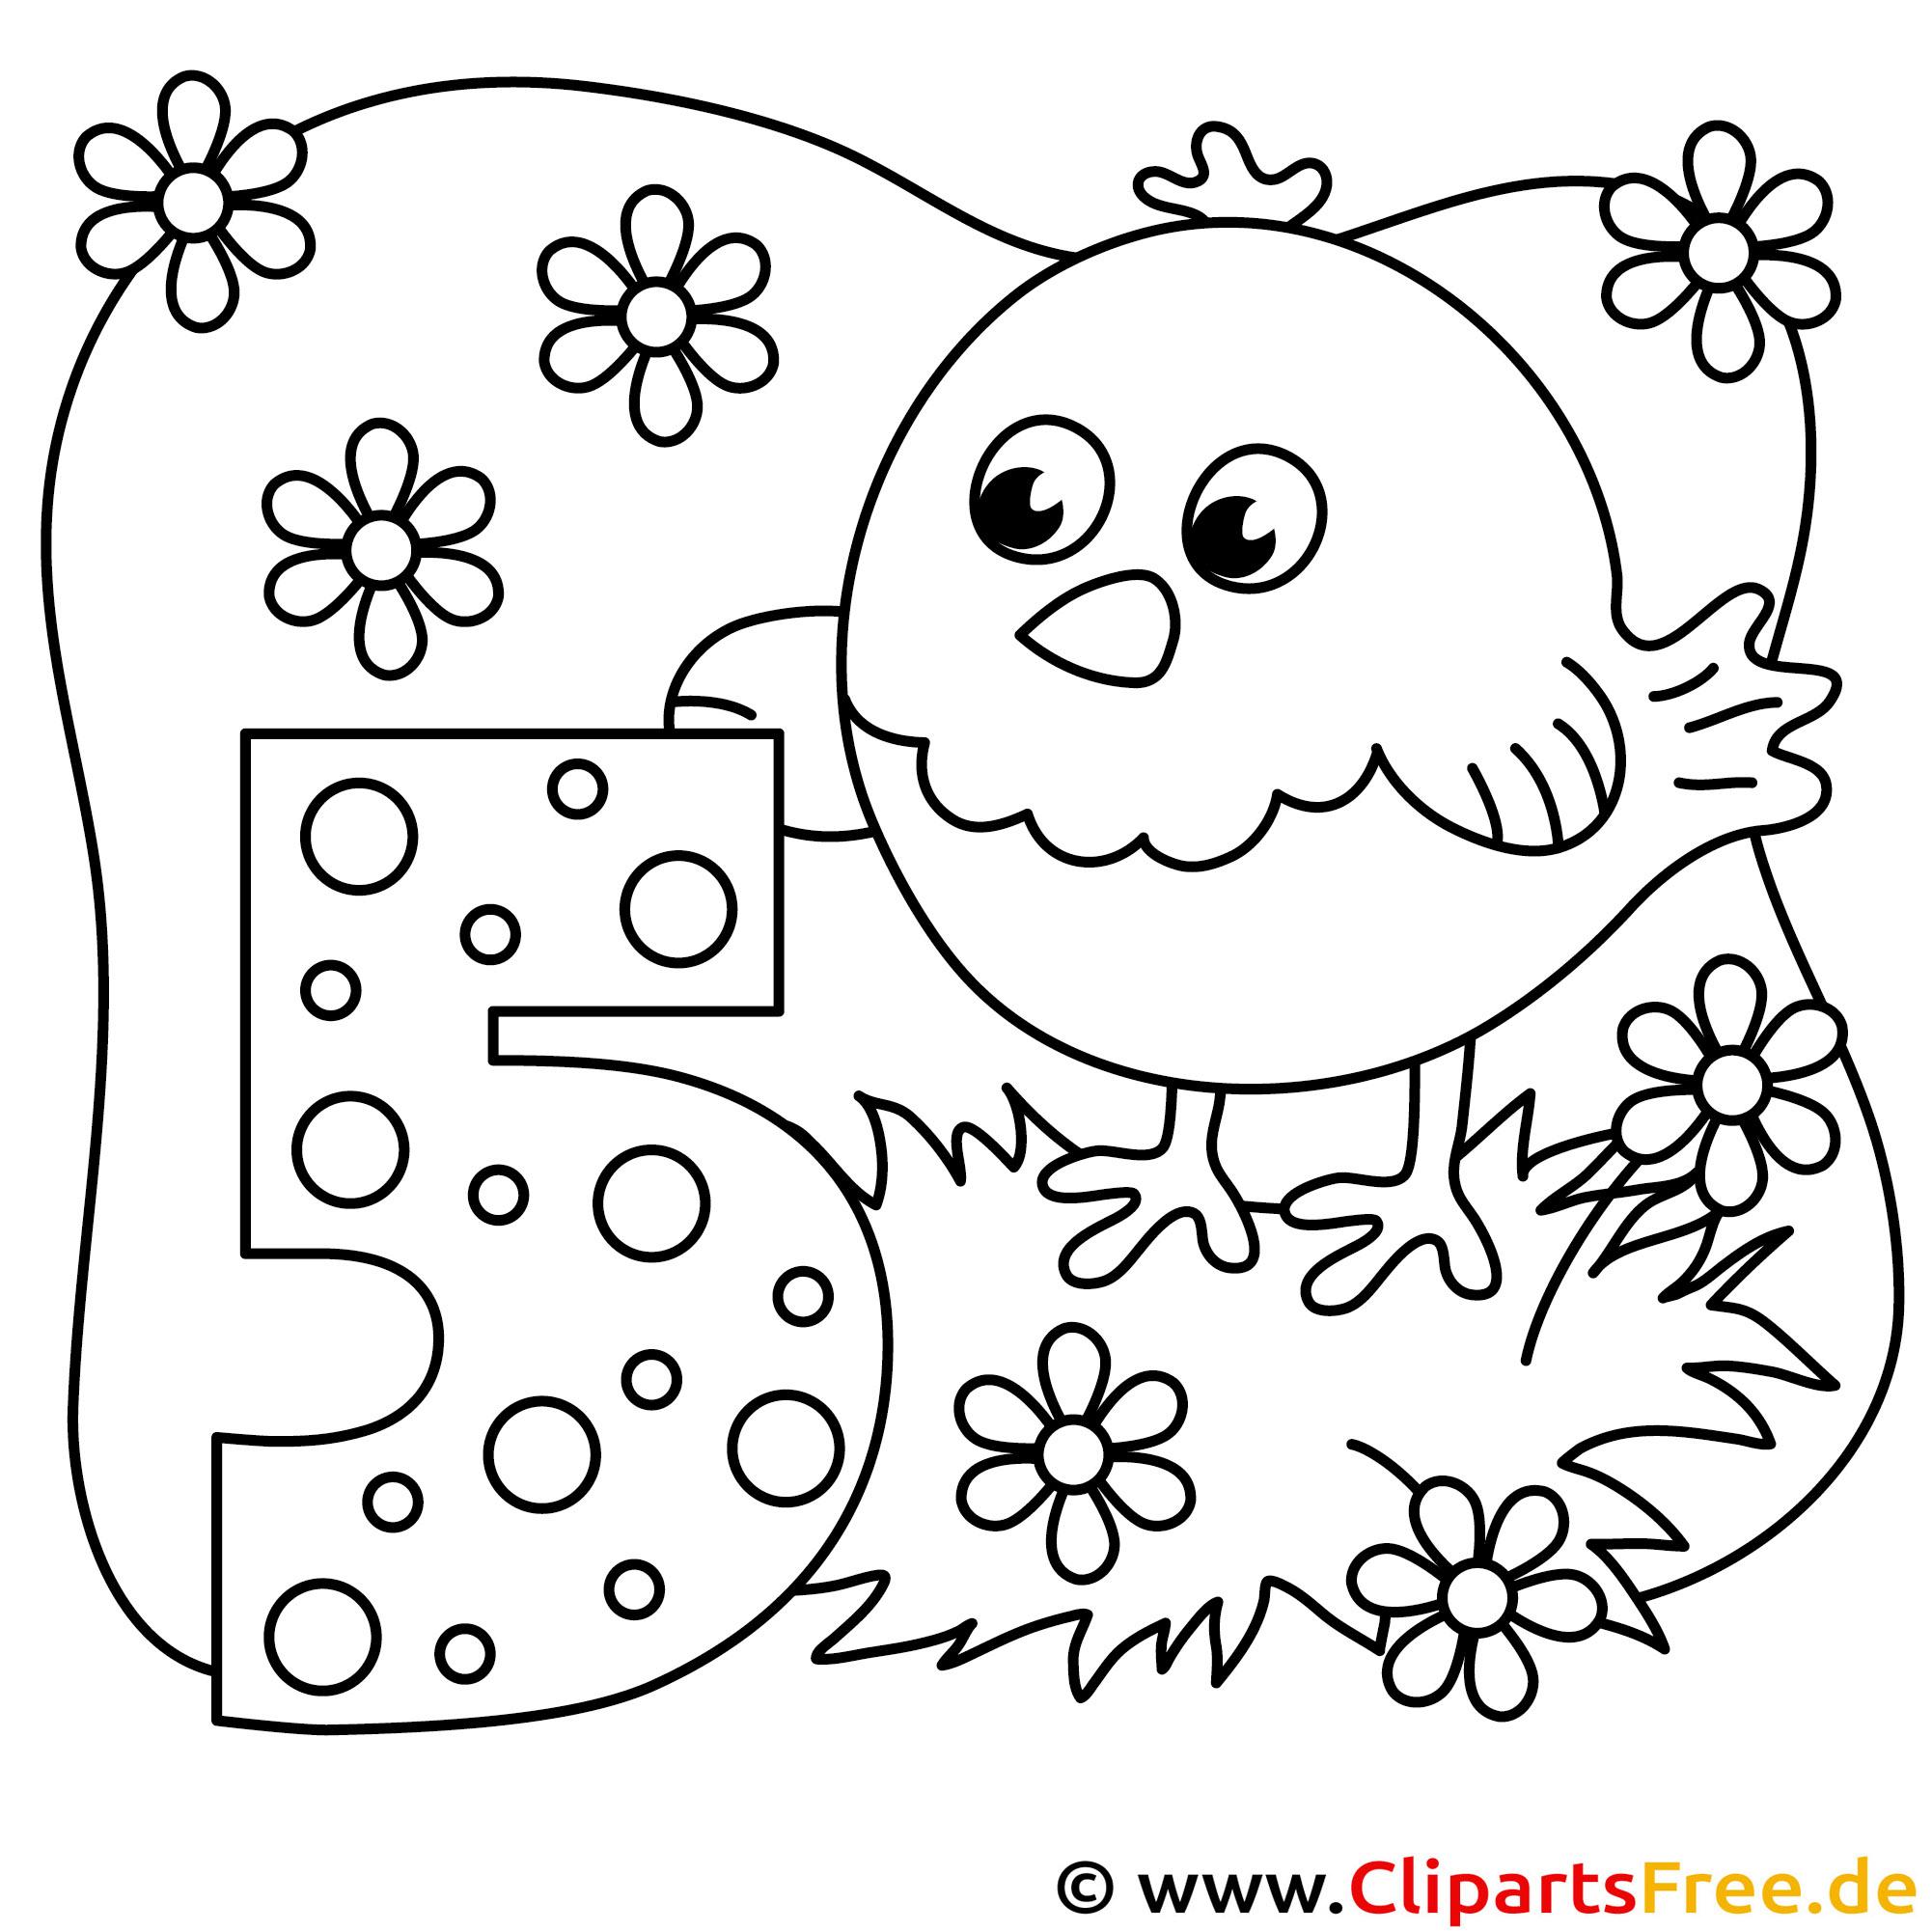 küken pdfausmalbild zum kindergeburtstag